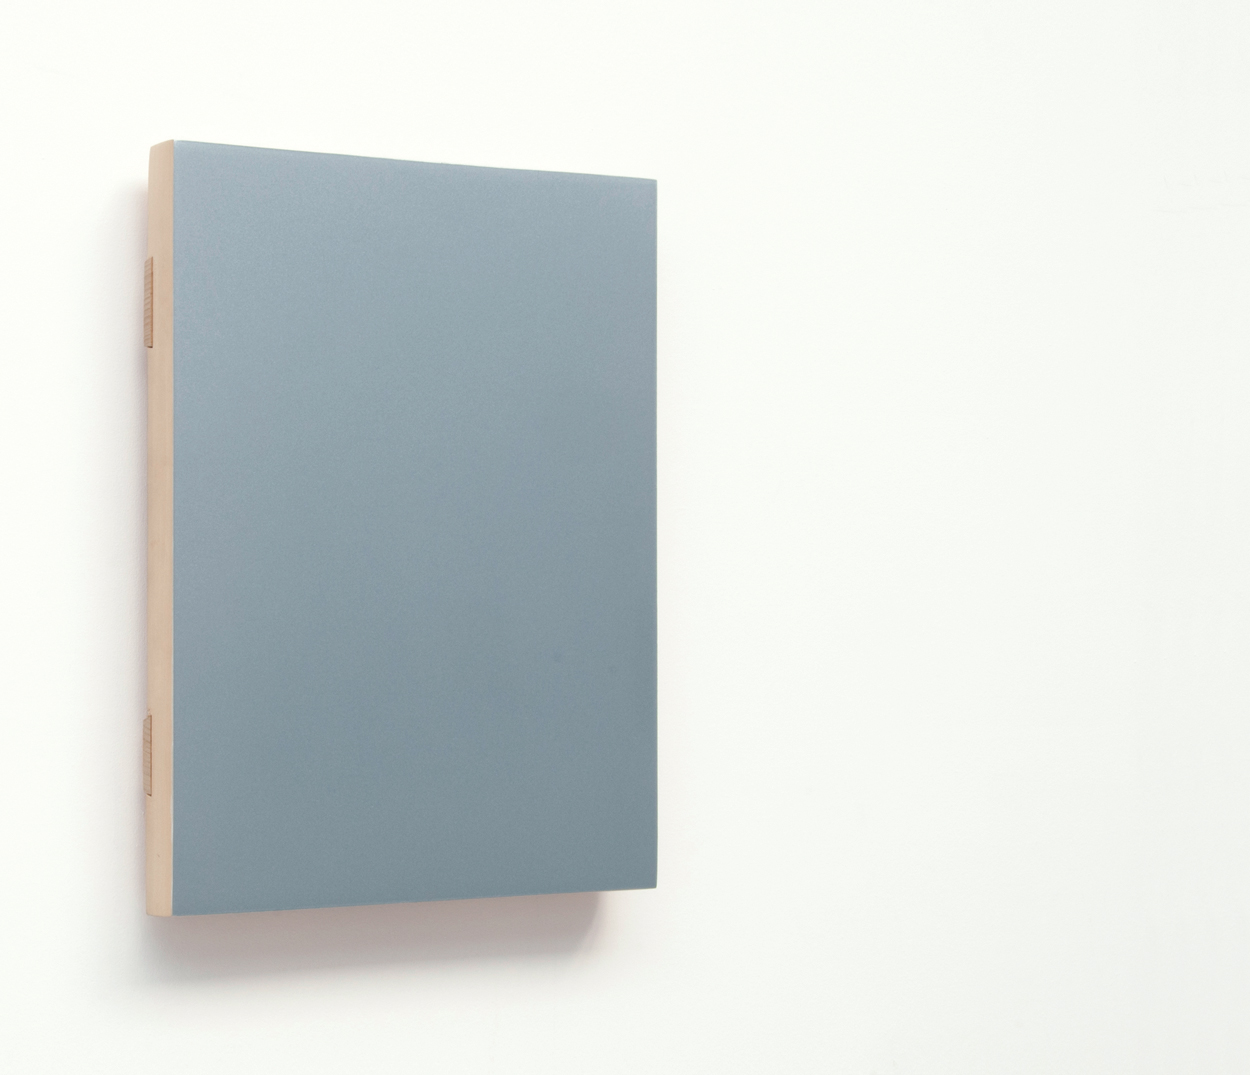 KOZAKIS - Audi_Blau_Q1.LYSJ, 2007, car_paint_on_wood_36,7x27